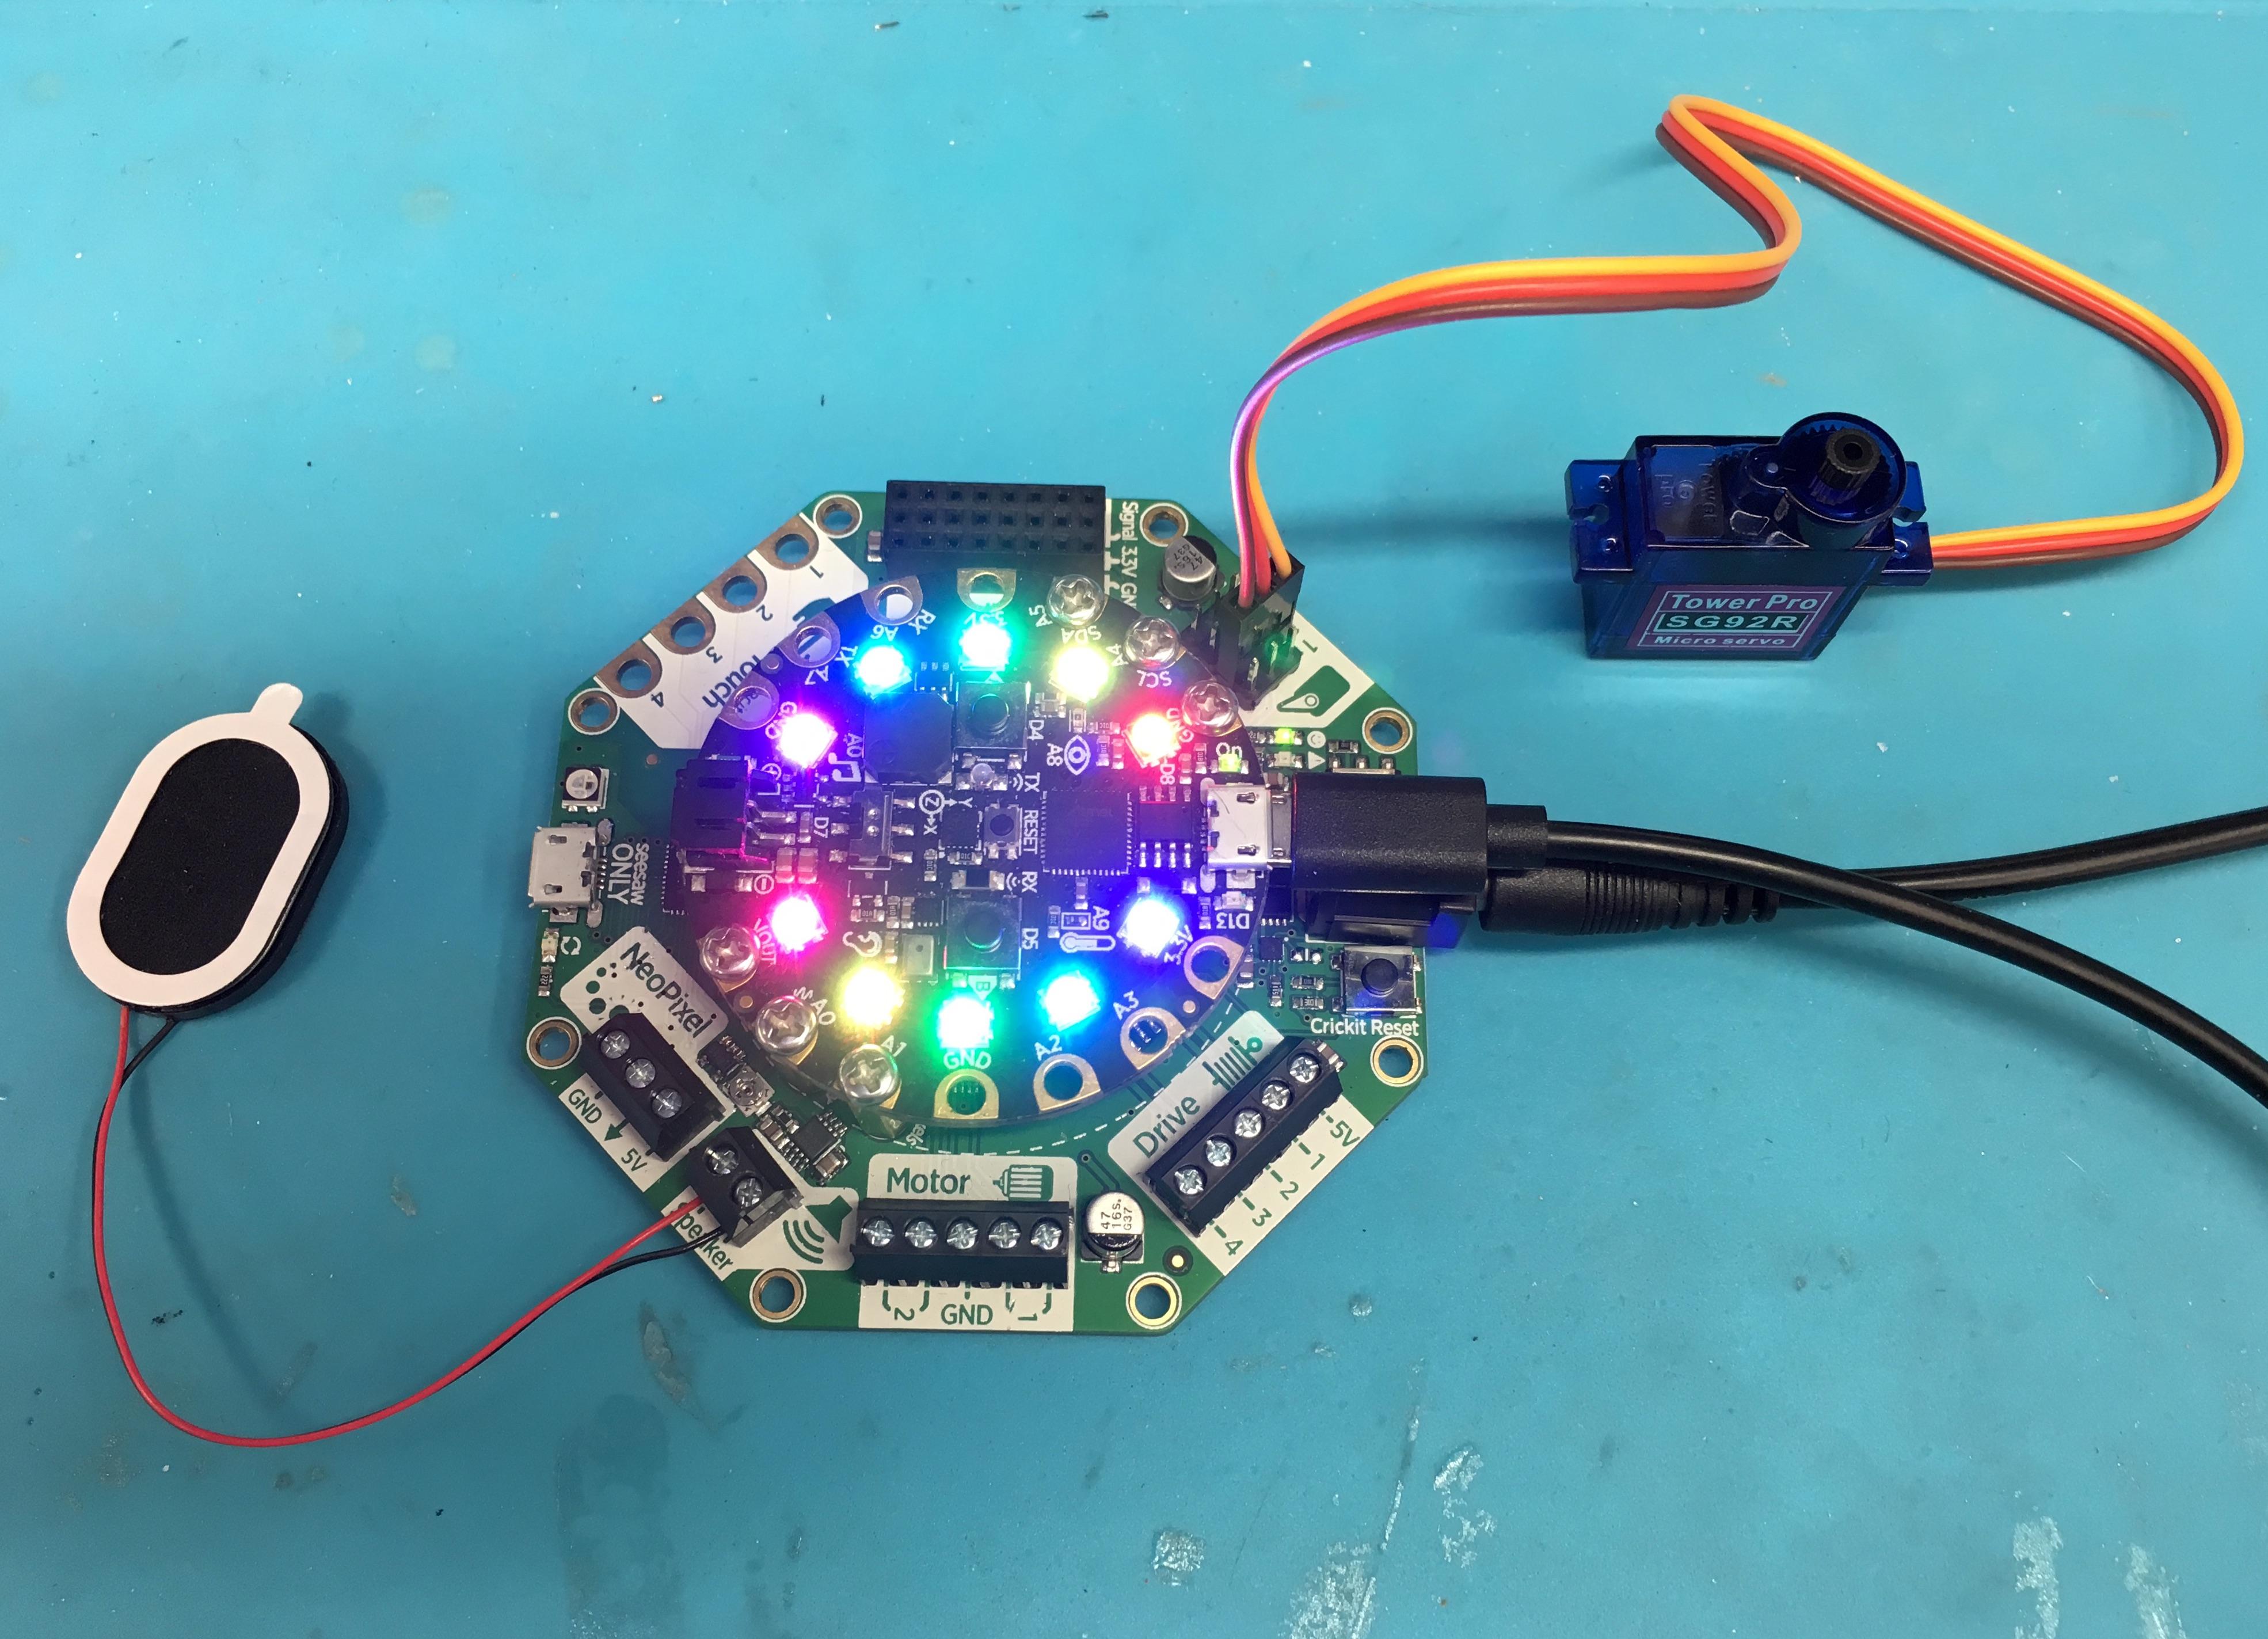 circuitpython_IMG_1002.jpg